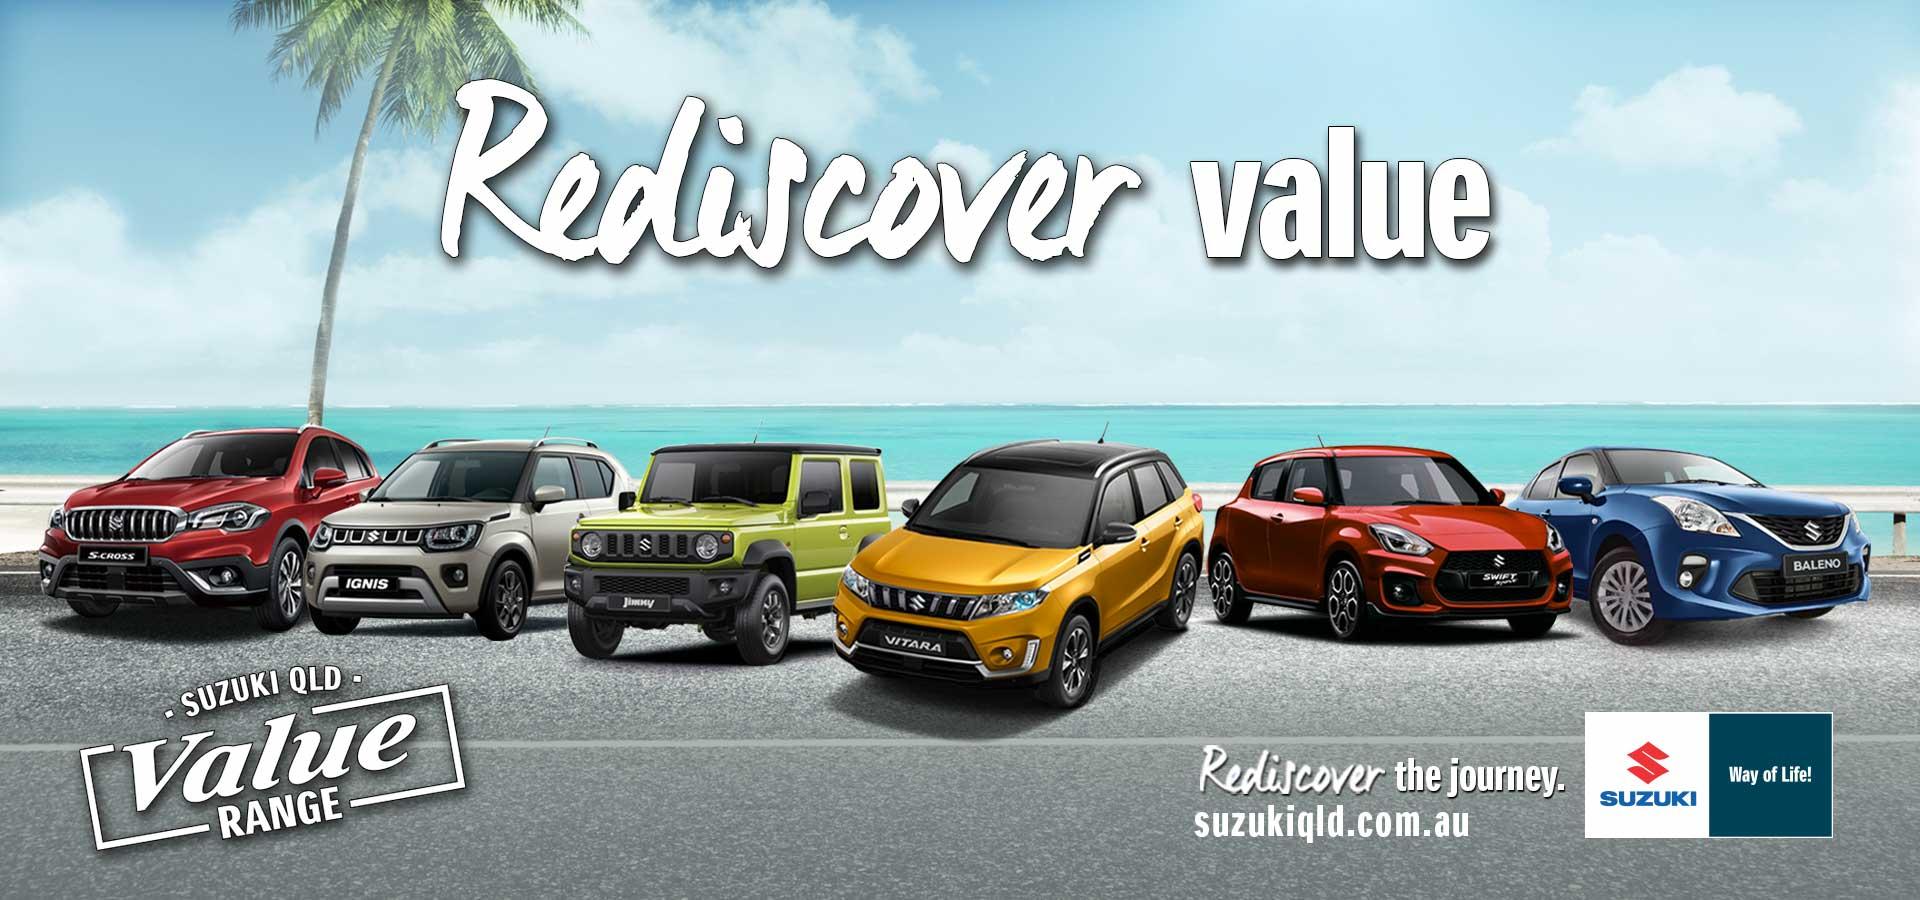 Suzuki QLD - Rediscover Value